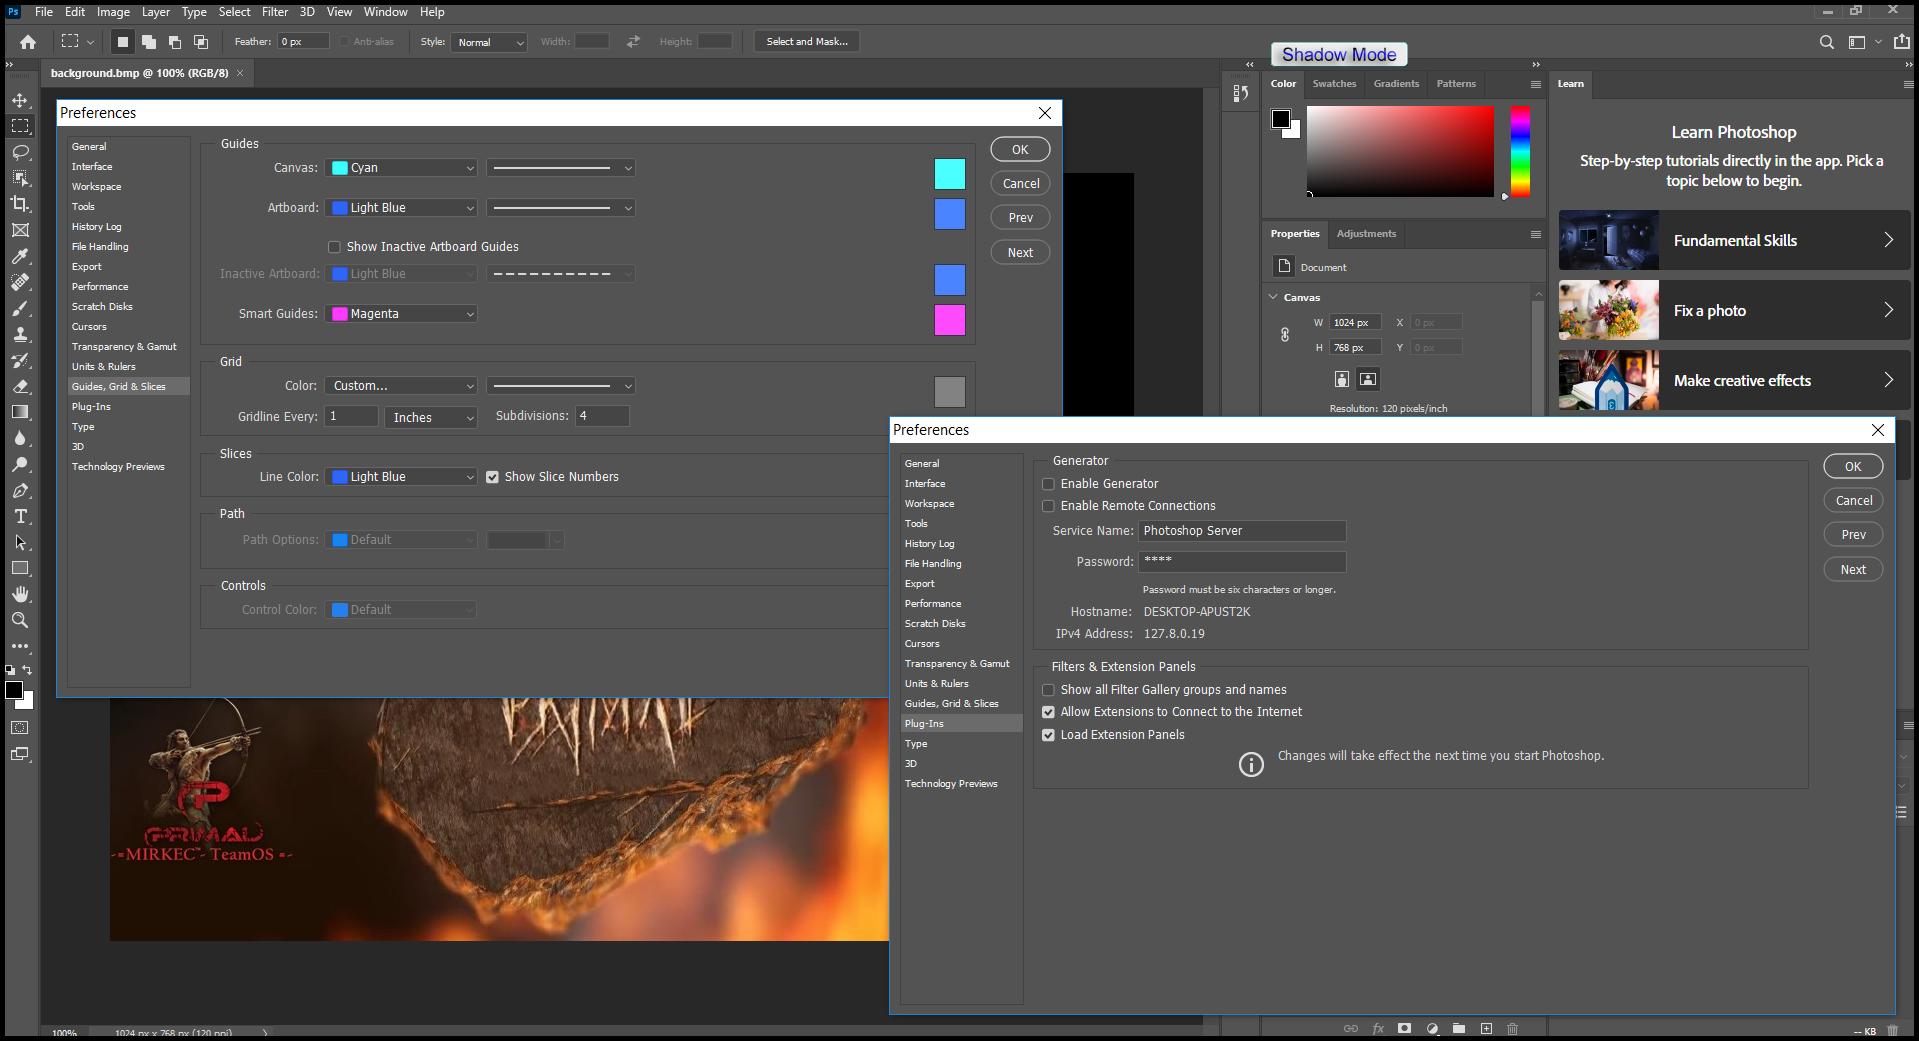 tải phần mềm pts portable Photoshop 2021 full